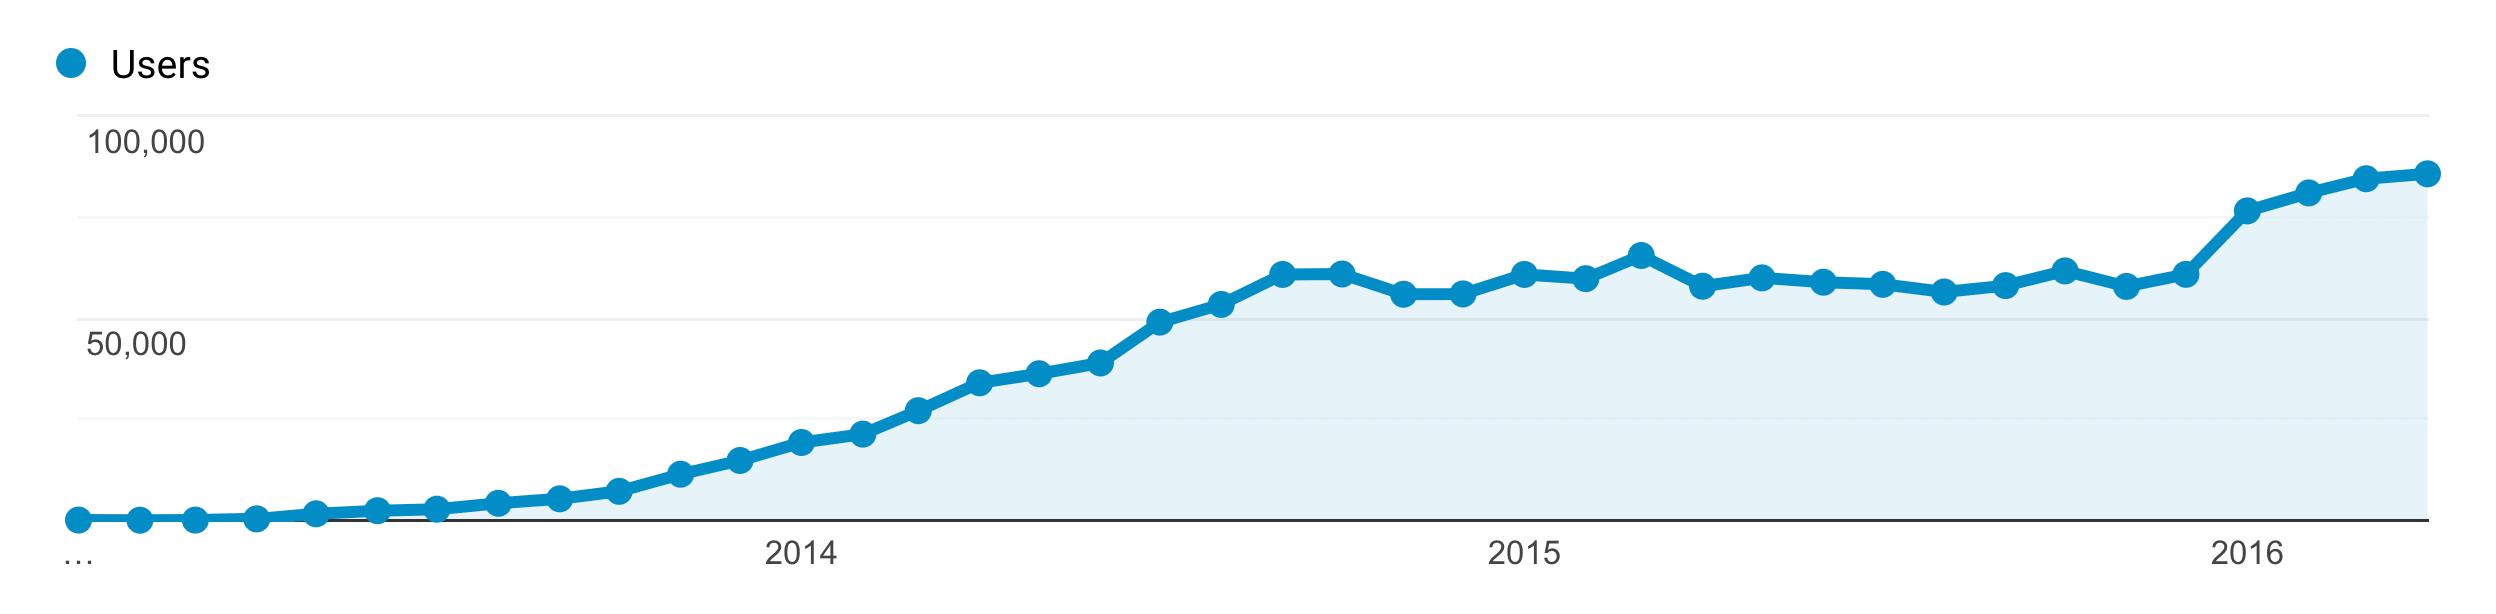 traffic graph years